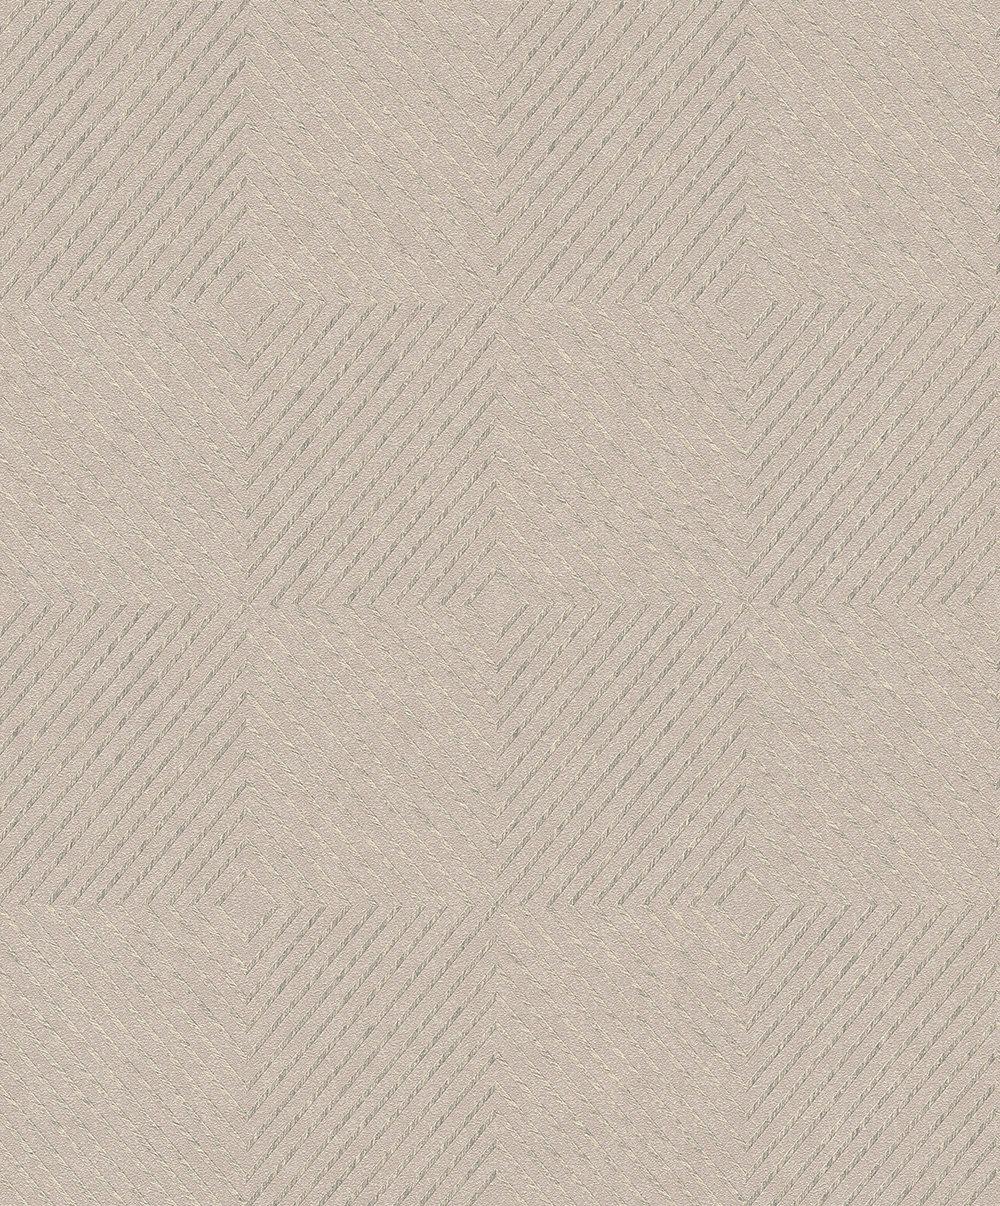 Metropolitan Stories Geometric Taupe Wallpaper - Product code: 36926-2